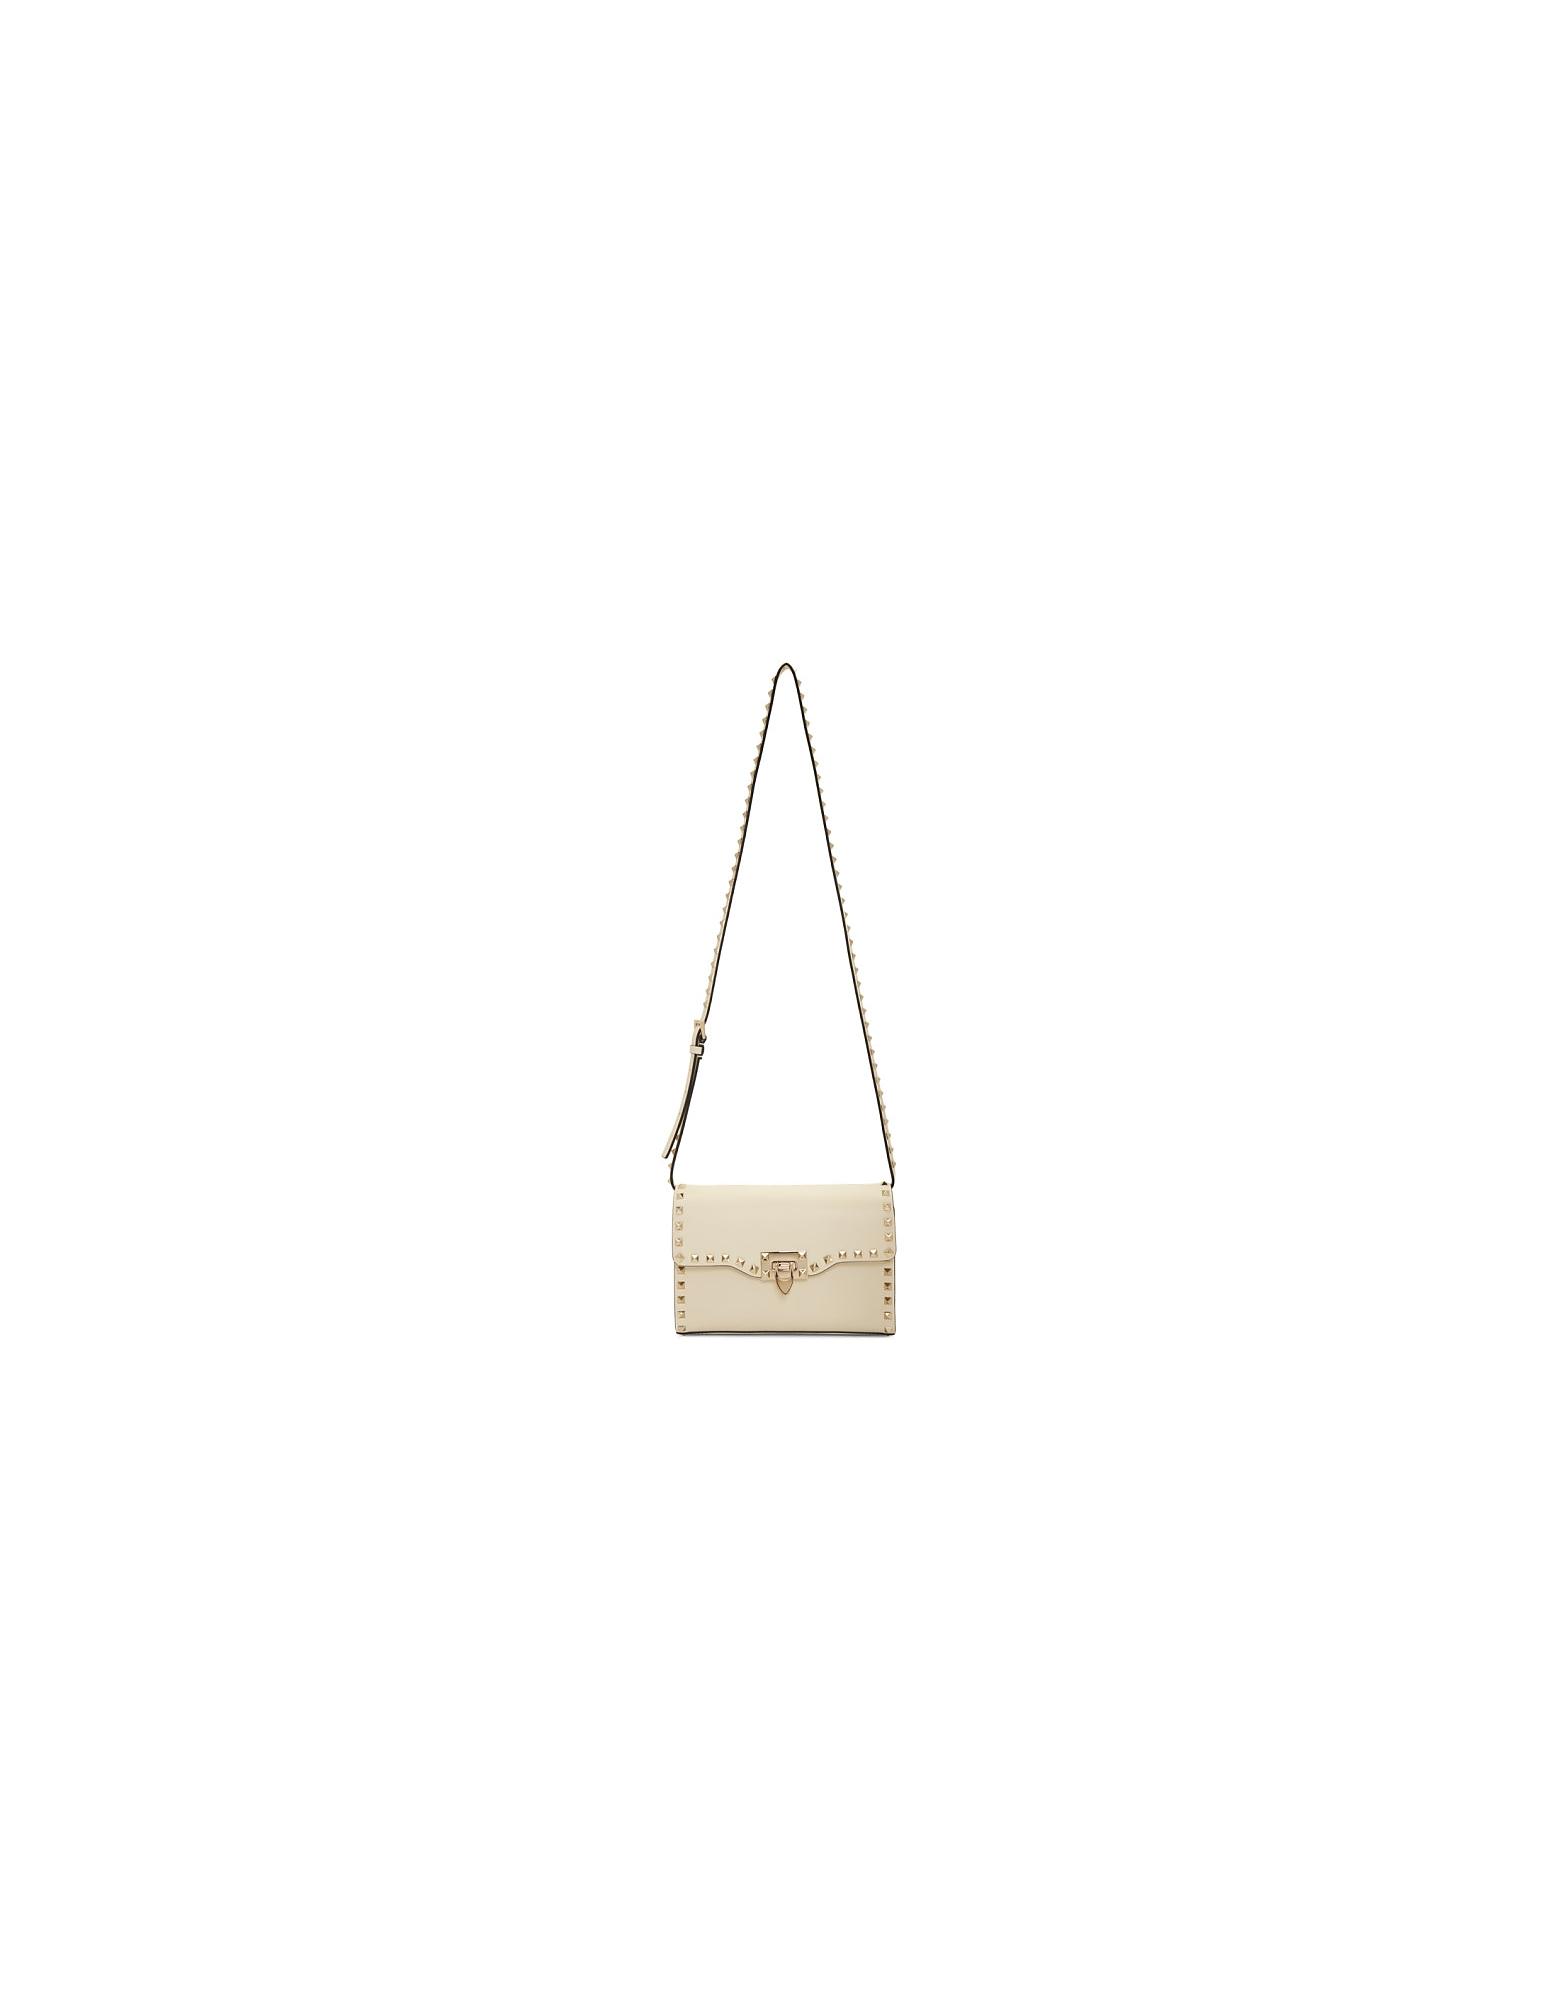 Valentino Designer Handbags, Off-White Valentino Garavani Medium Rockstud Flap Bag